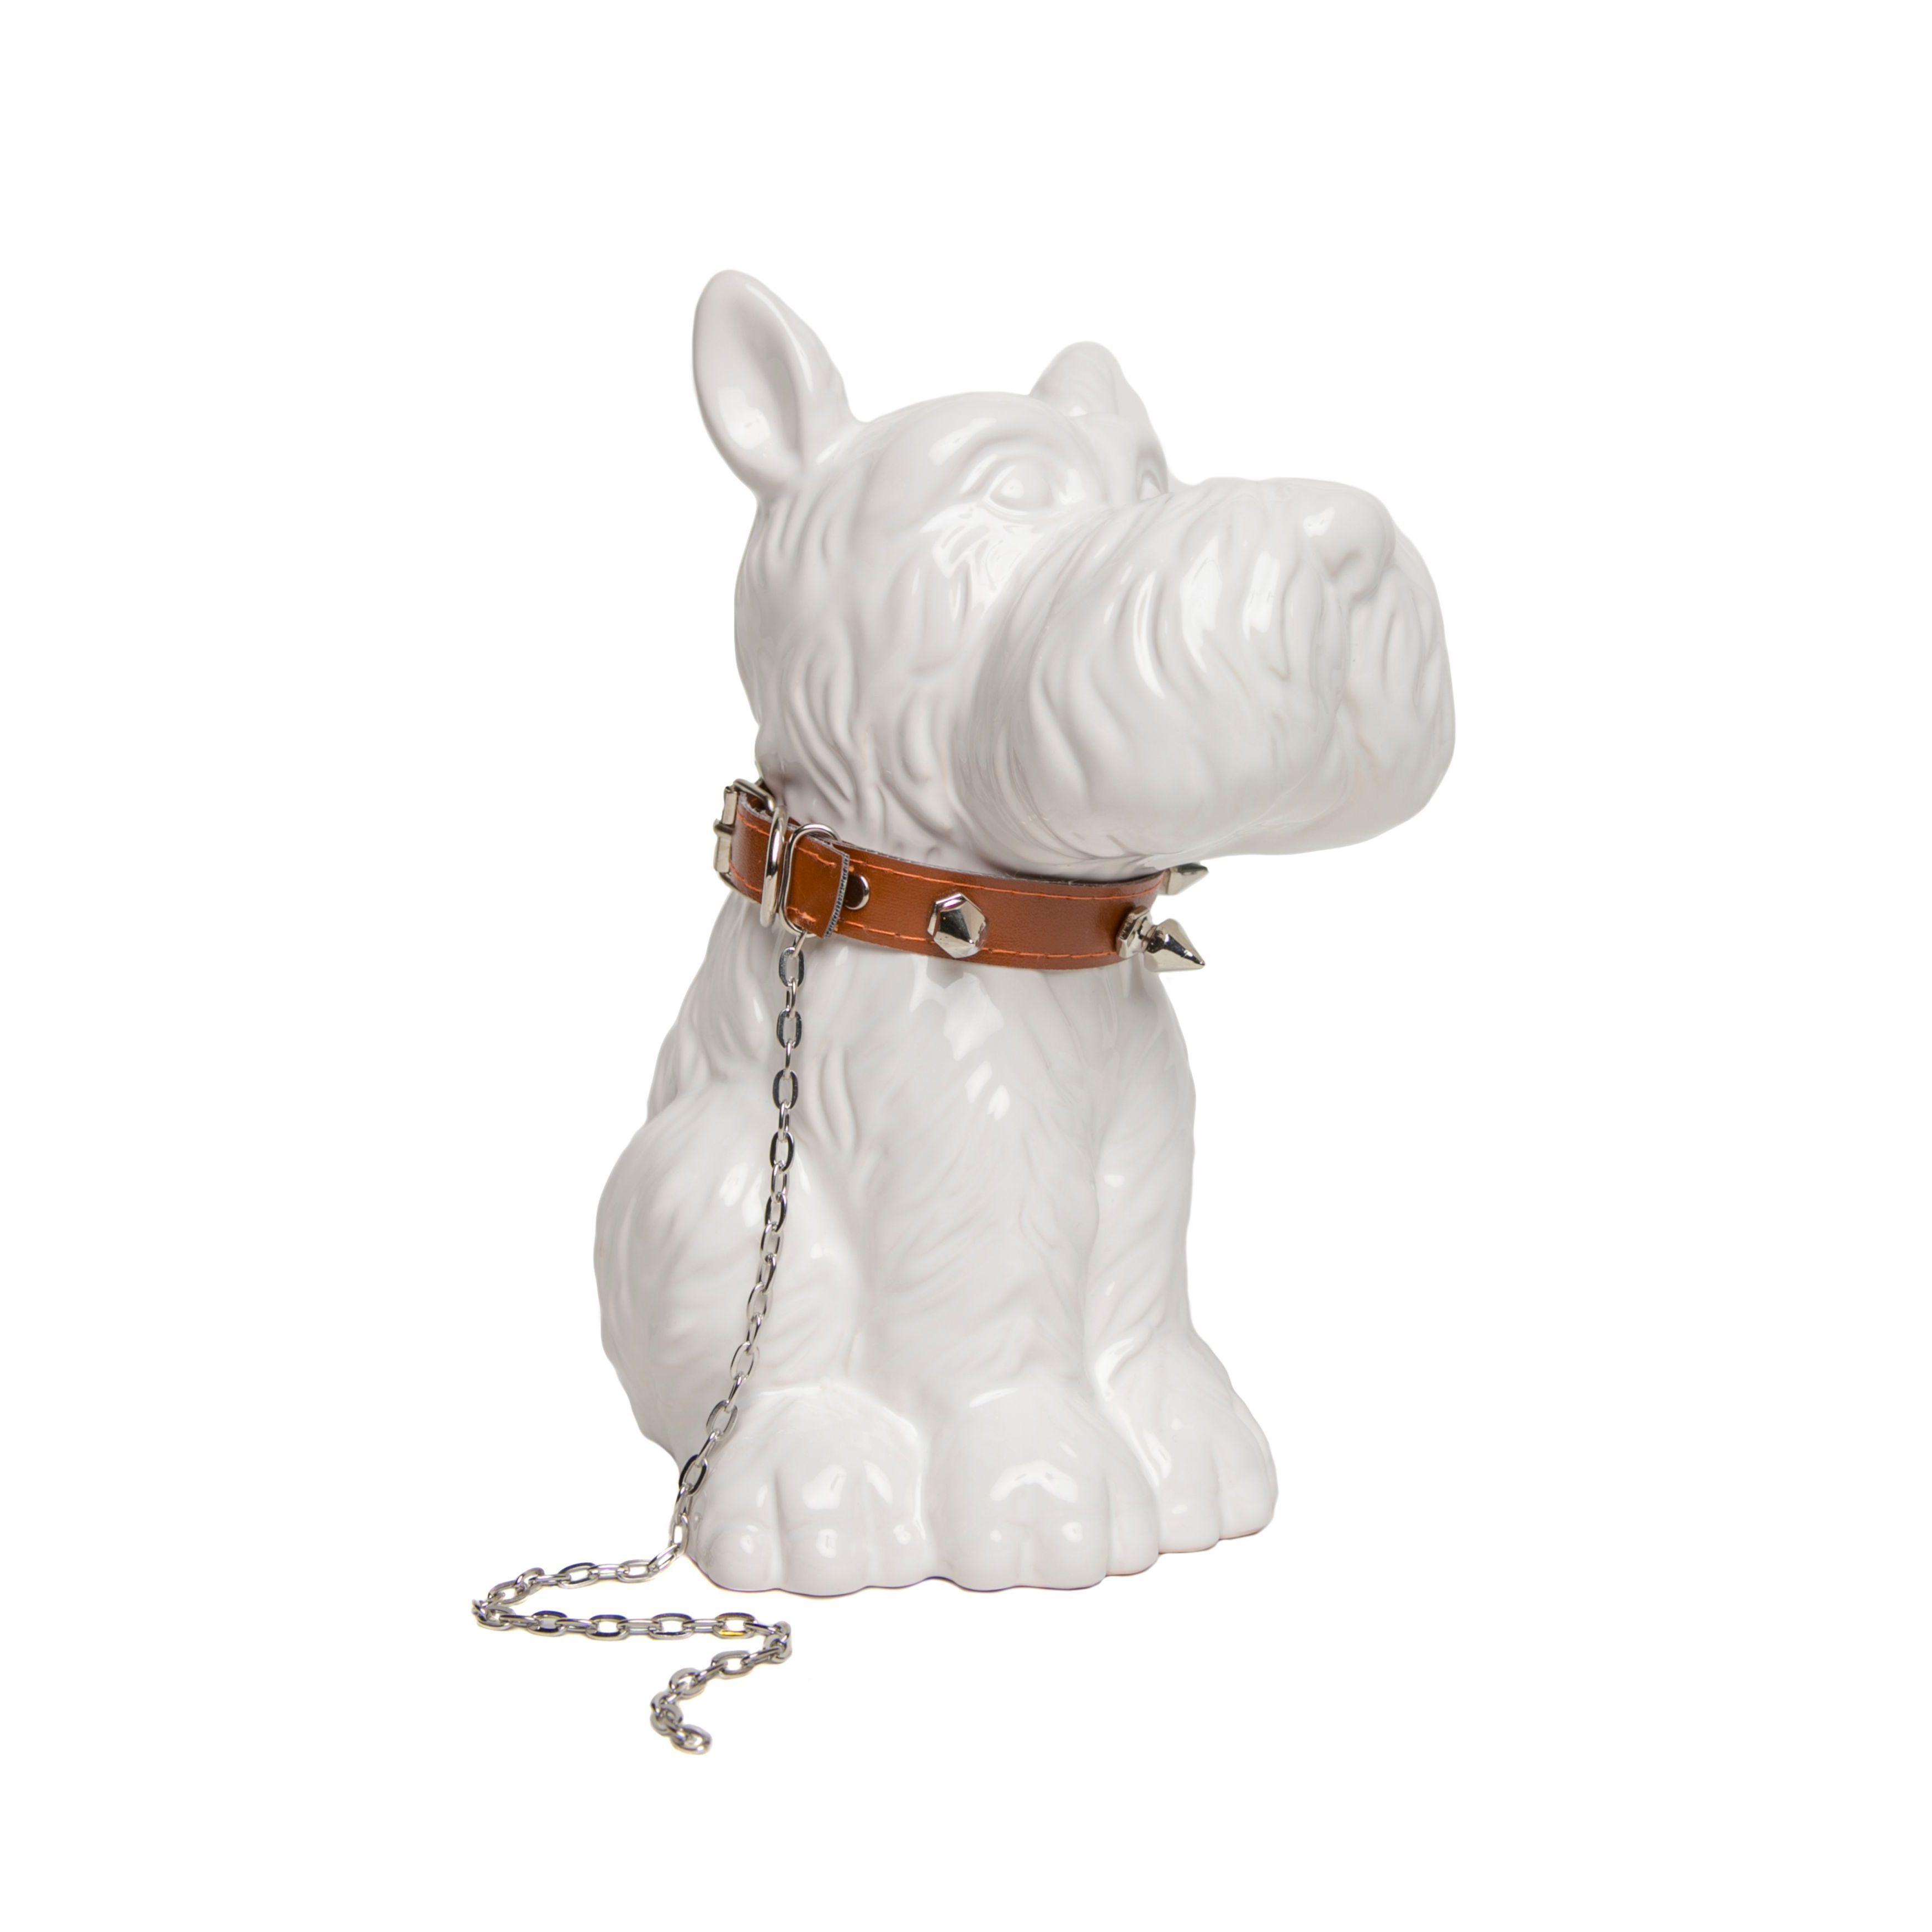 Scottie Dog Bank with Brown Collar (Accent Piece), White (Ceramic ...